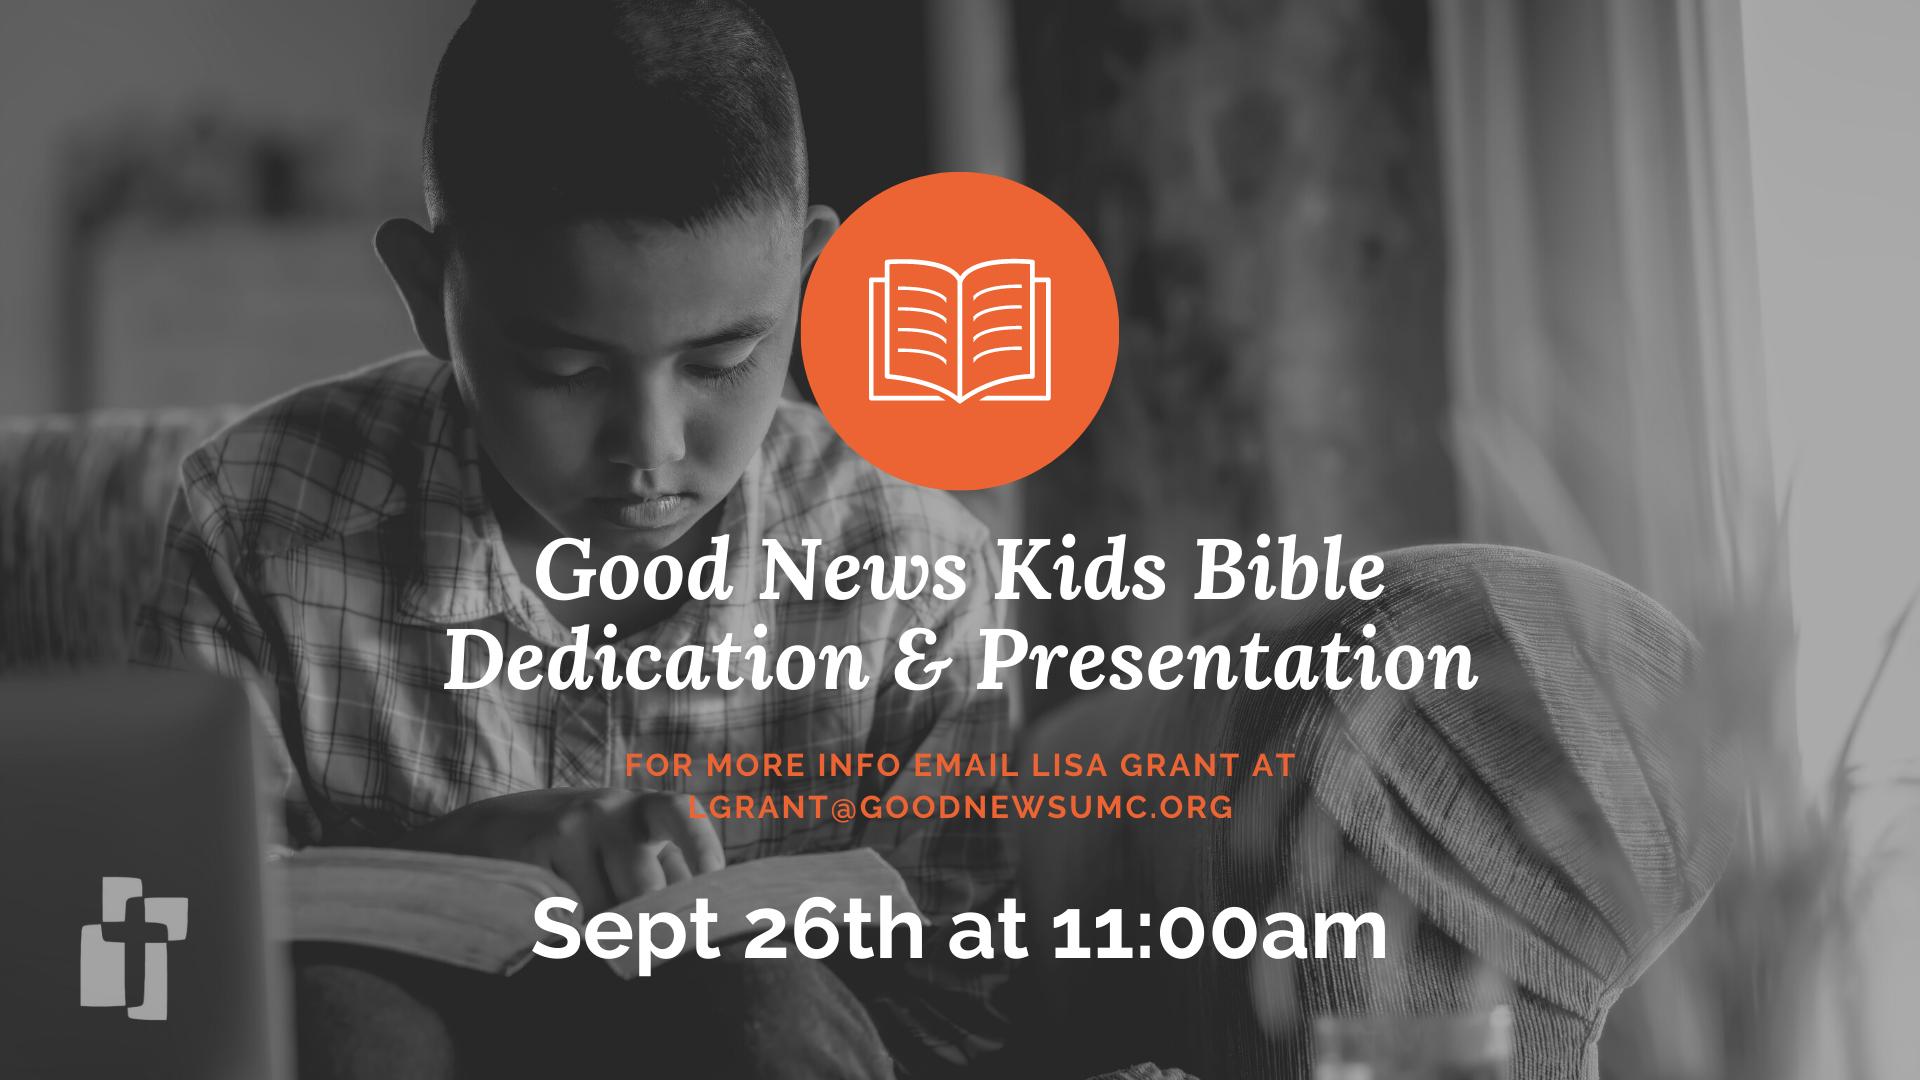 GN Kids Bible Dedication & Presentation (2)